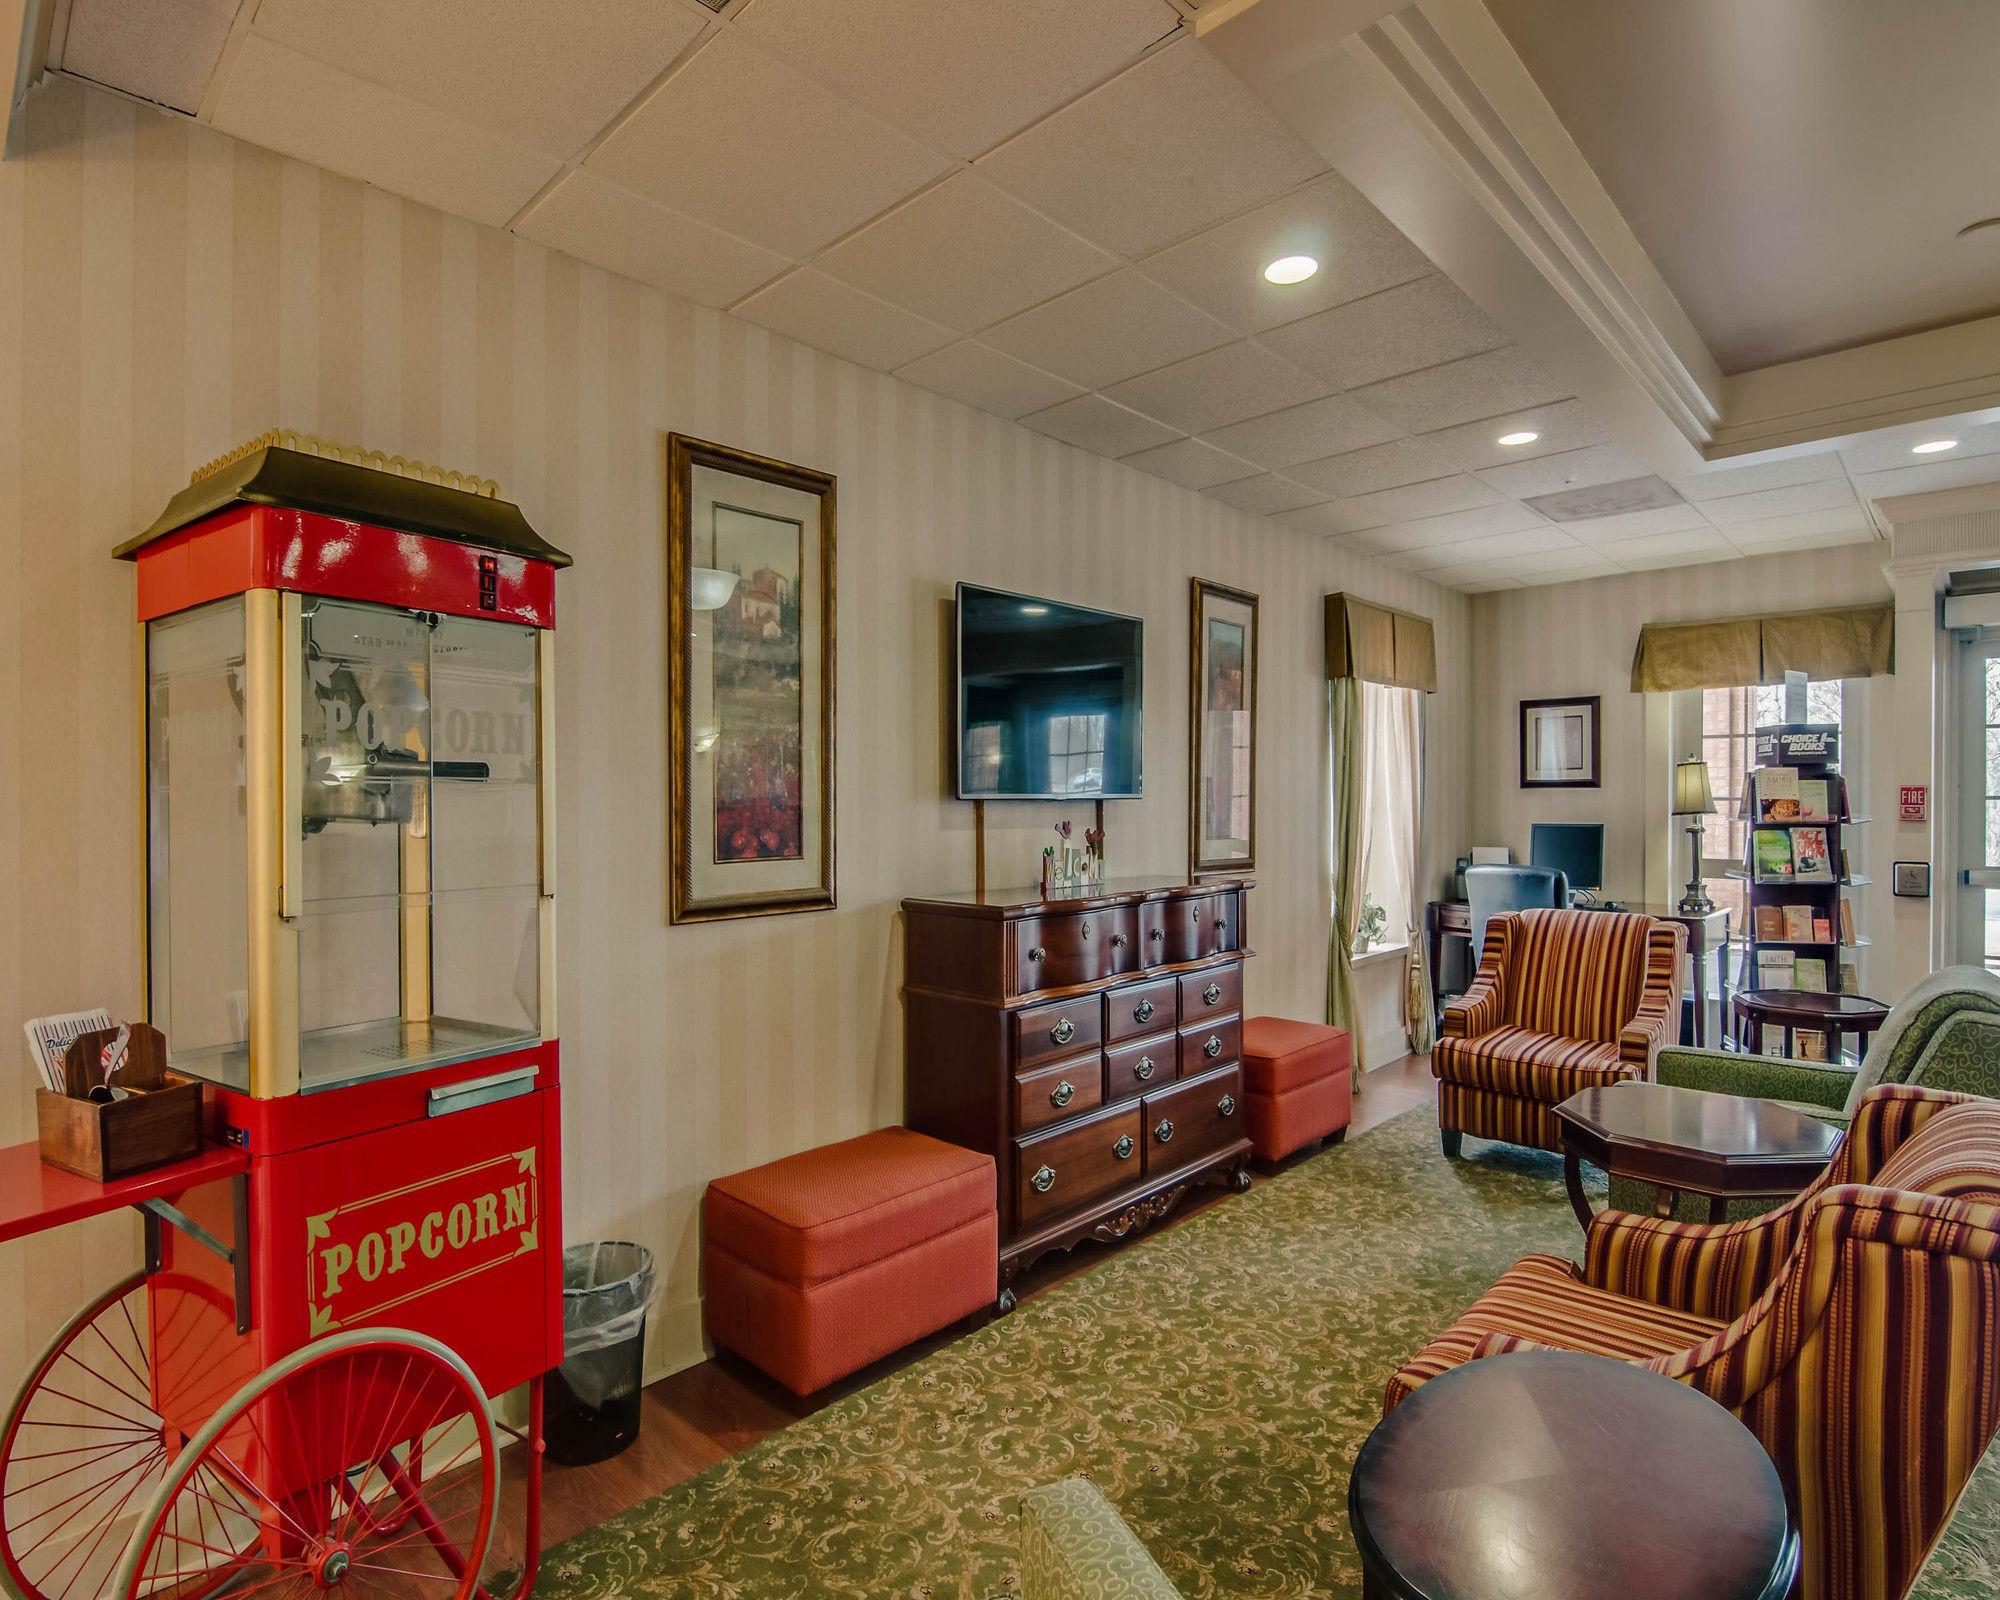 Comfort Inn in Staunton, VA